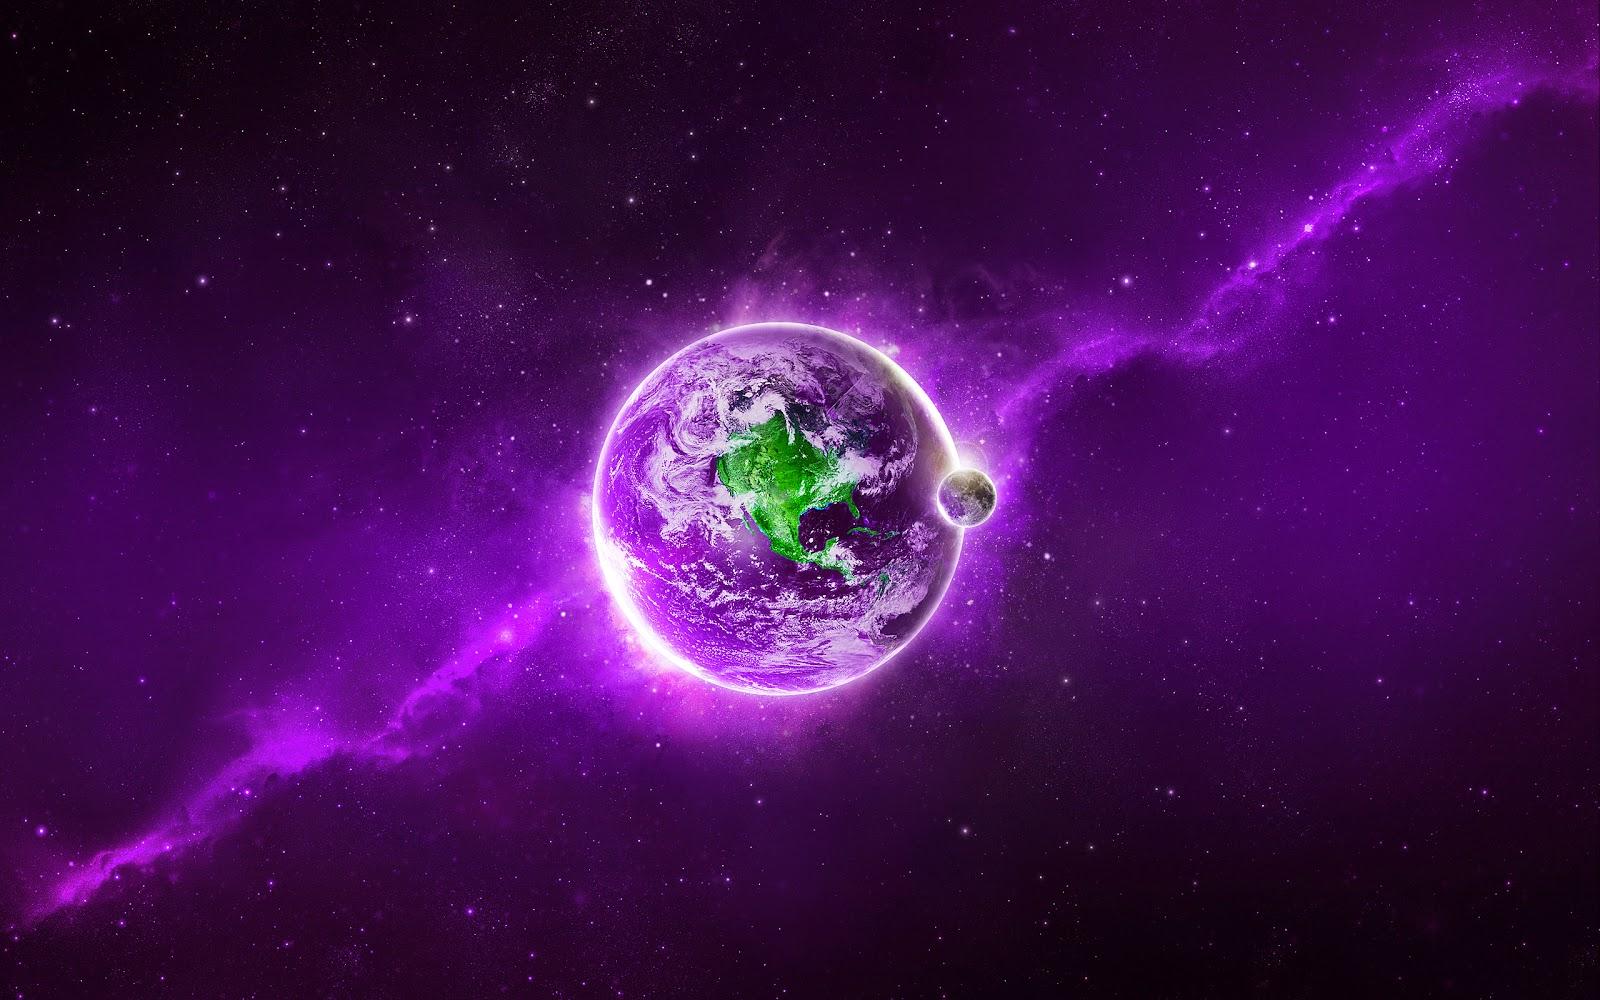 purple hd desktop wallpapers widescreen - photo #10